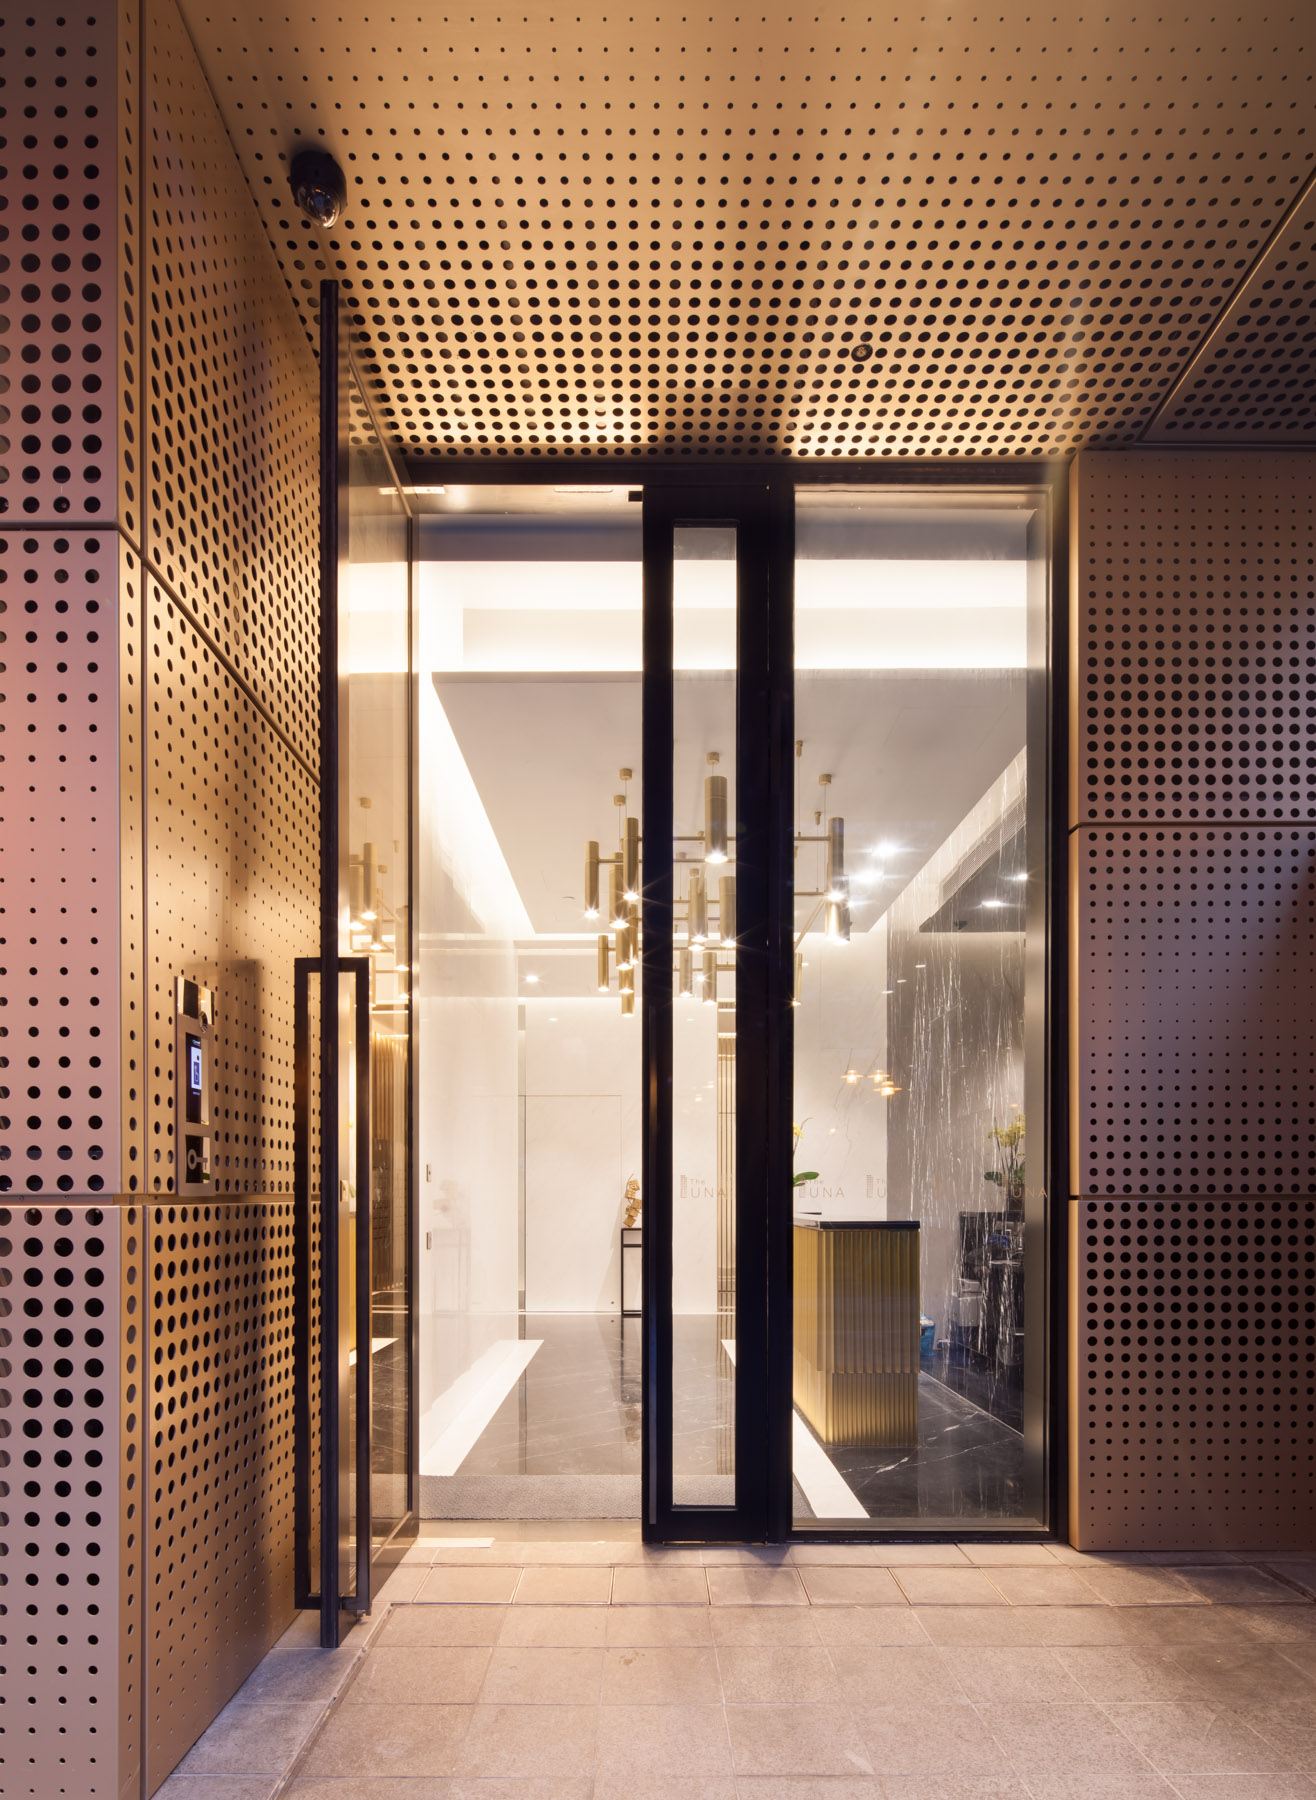 Luna_JM01_Reception-0157_ Anahita Chouhan Architect Interior designer Architects.jpg